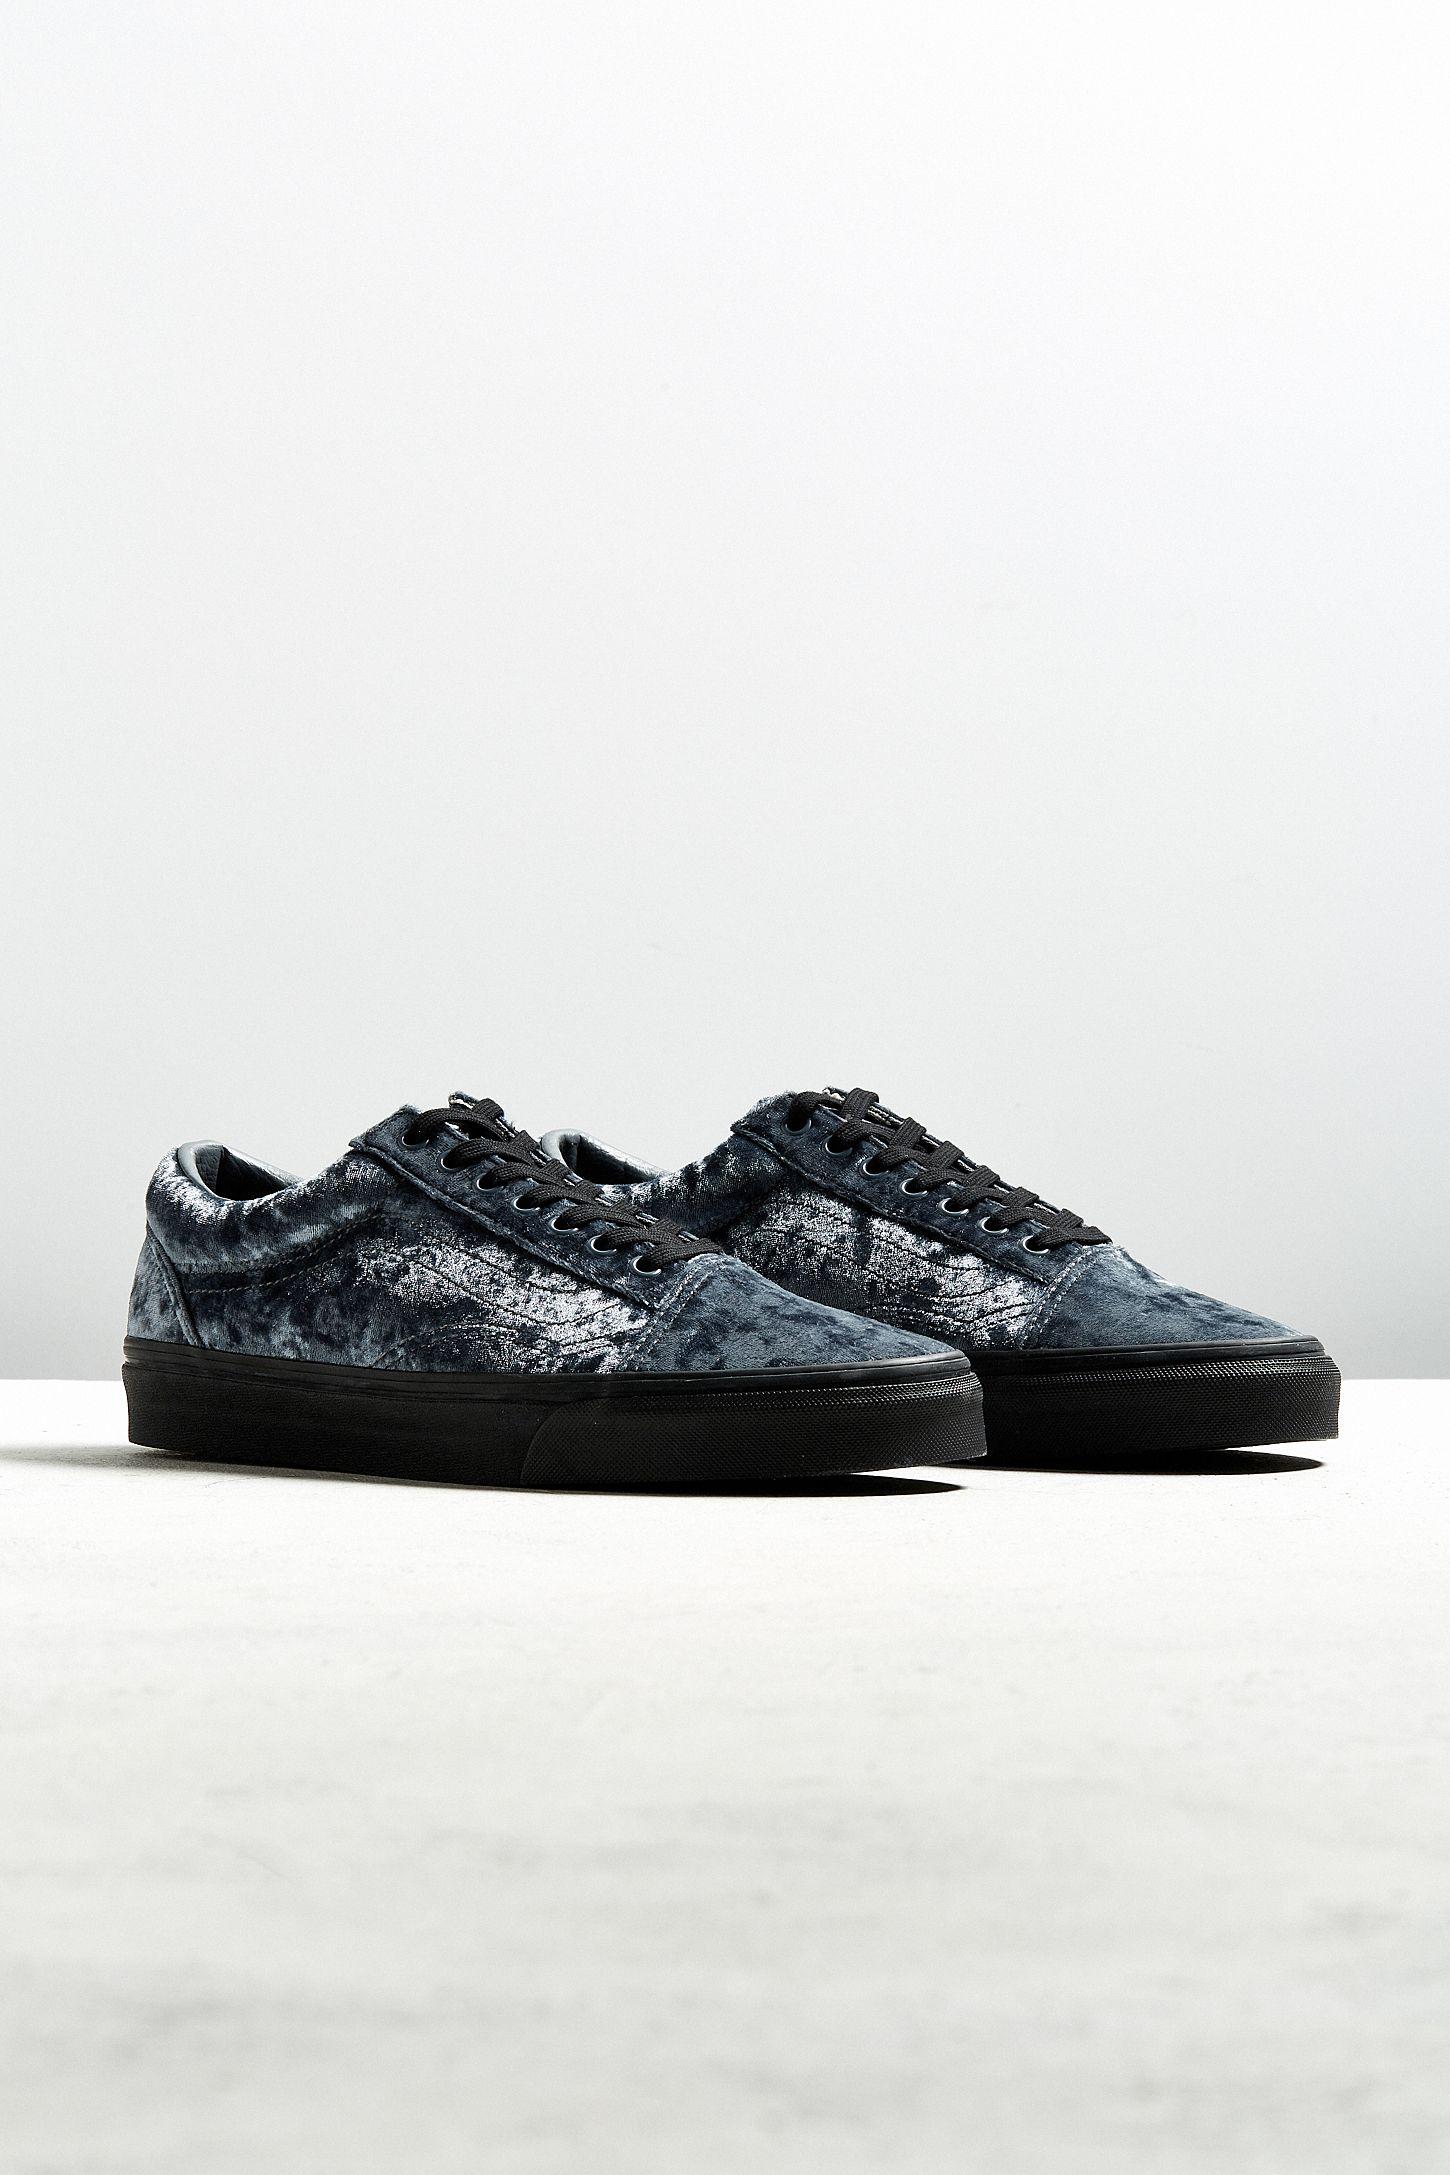 5aff86d641 Vans Old Skool Grey Velvet Sneaker